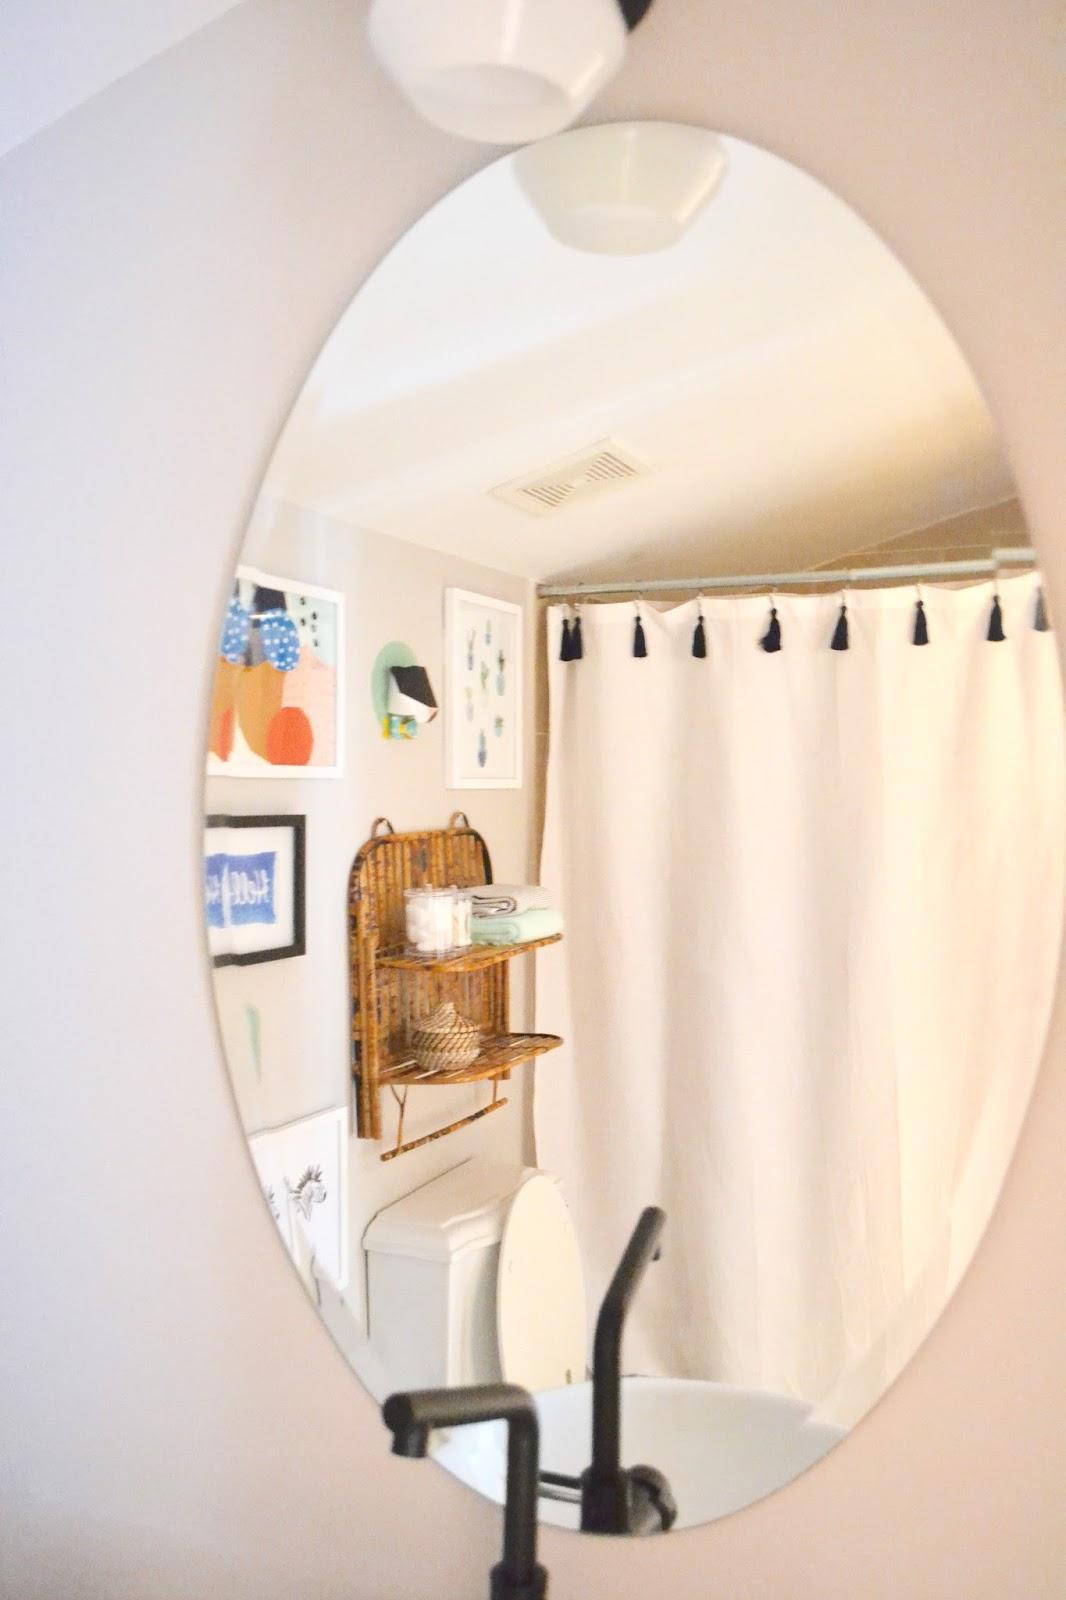 DIY Tassel Shower Curtain 5 Minute